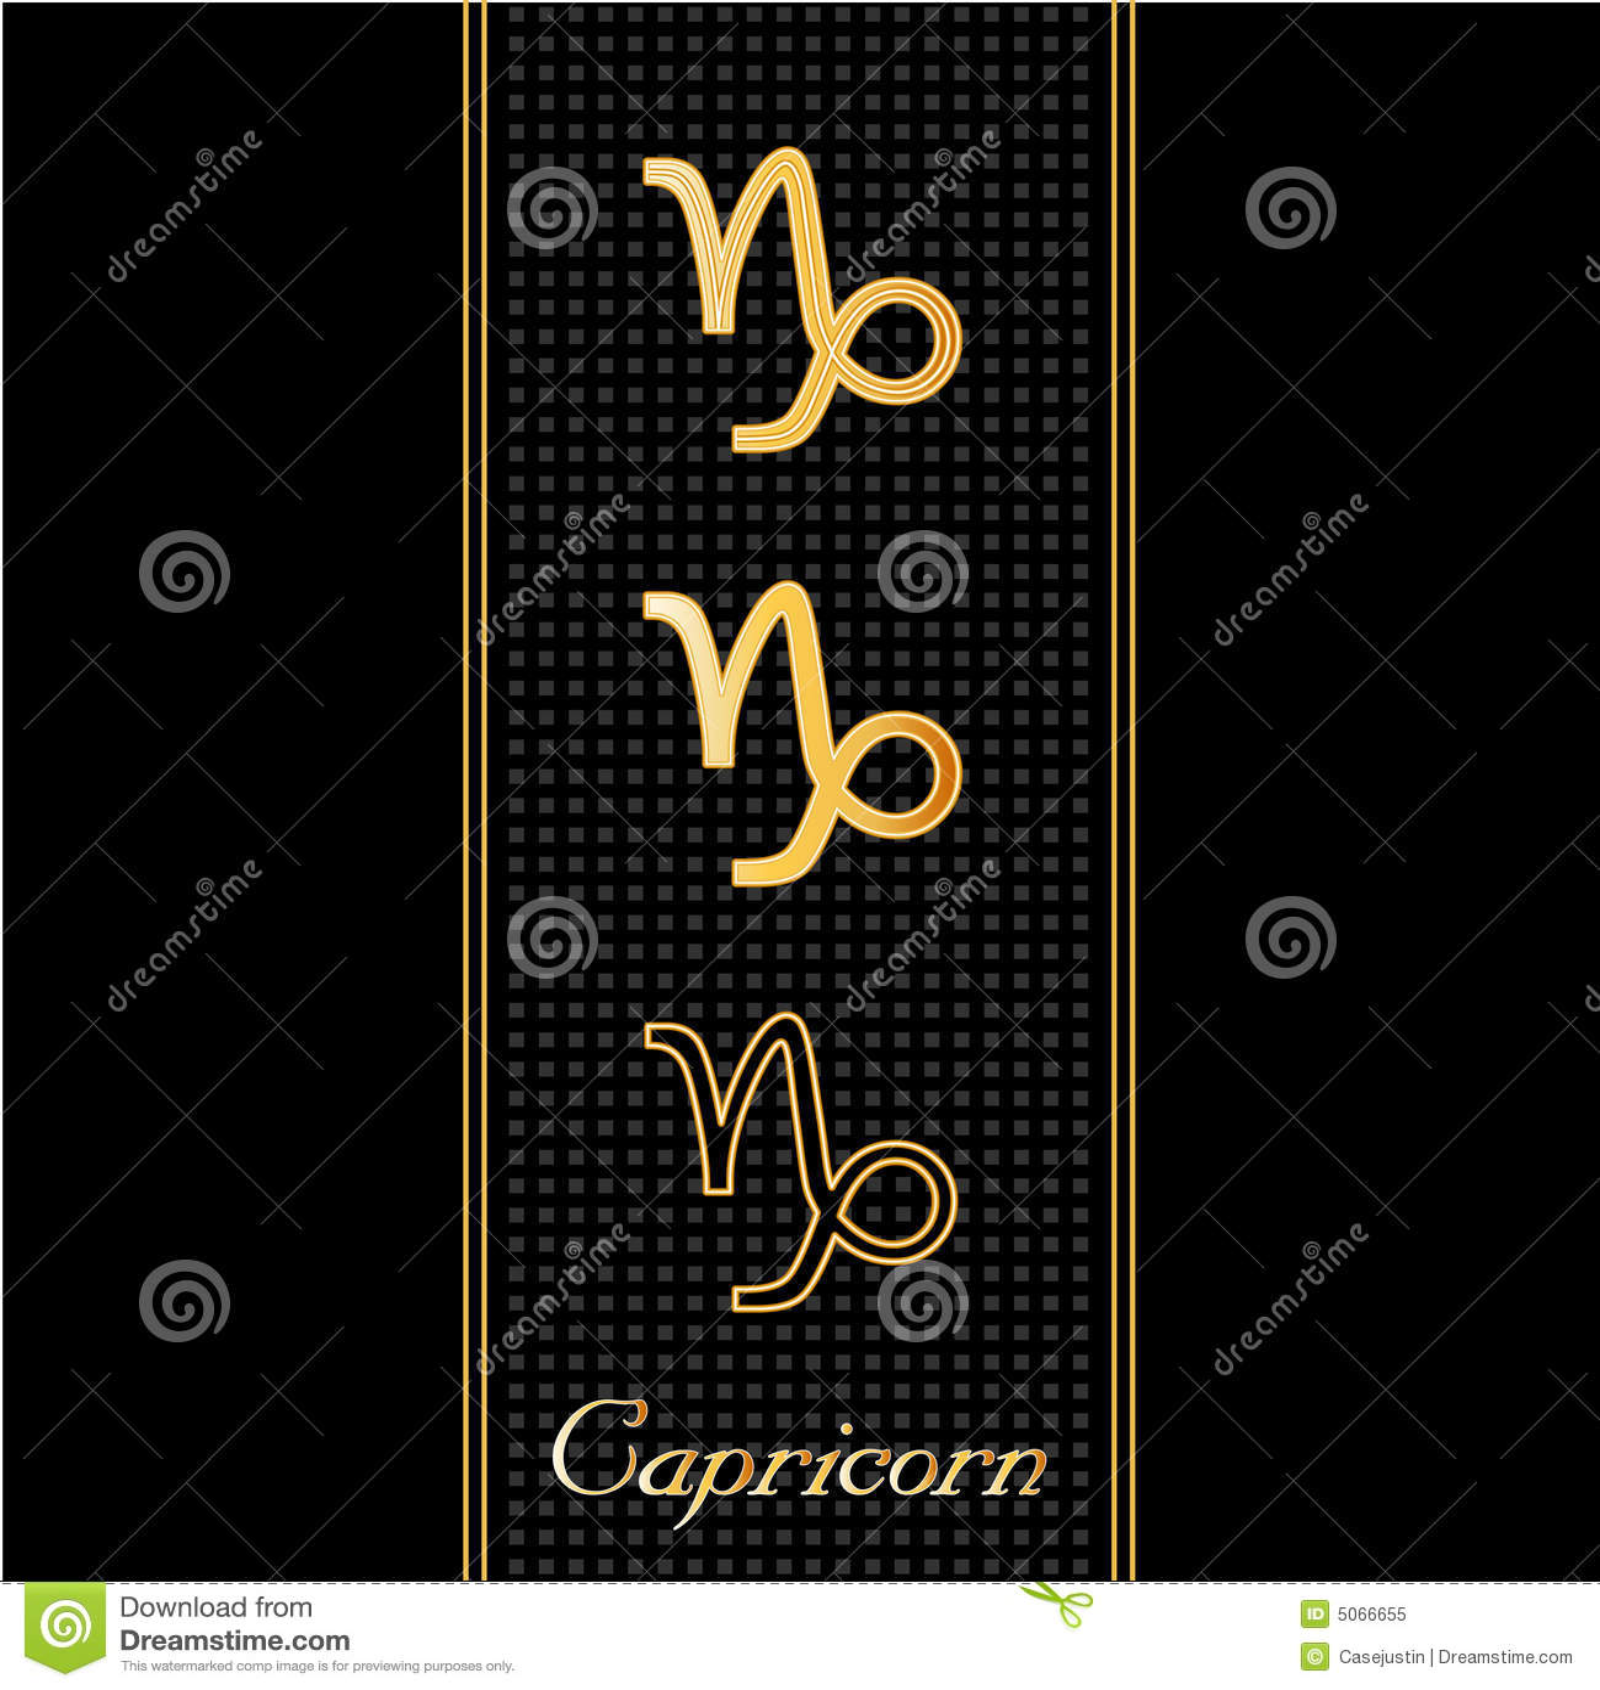 Capricorn Horoscope Symbols Capricorn Horoscope